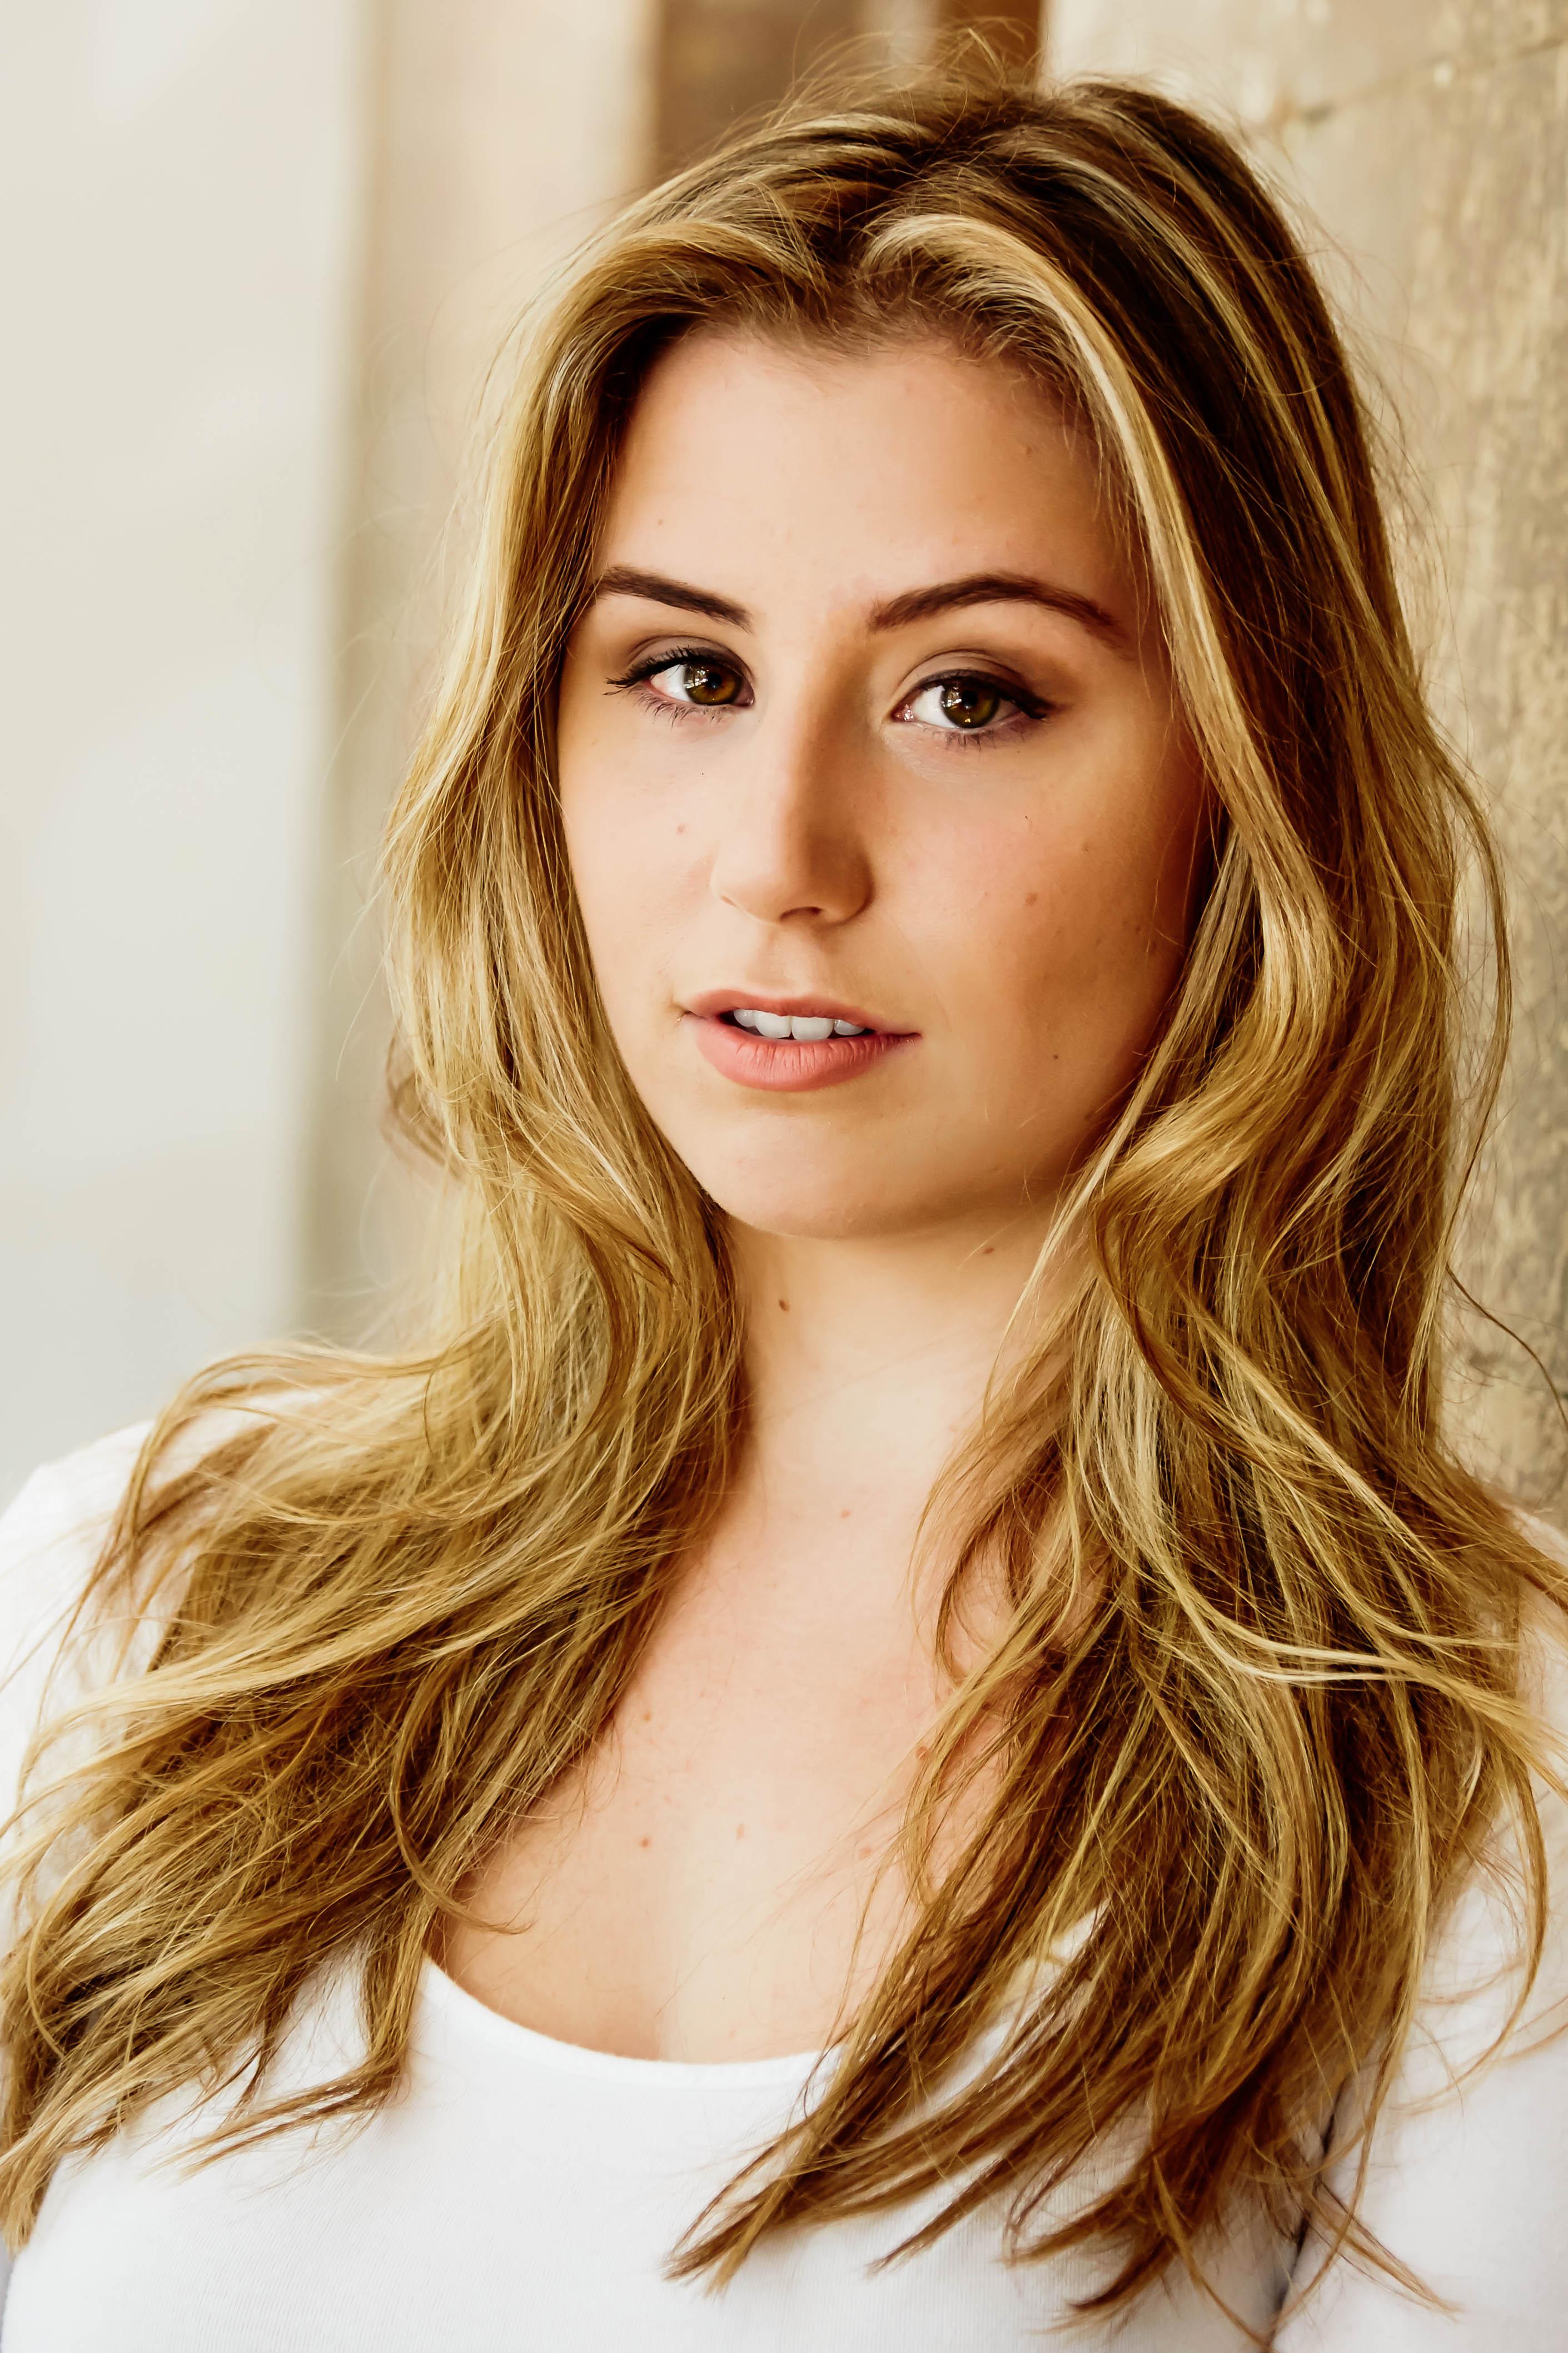 Charlotte Riddle